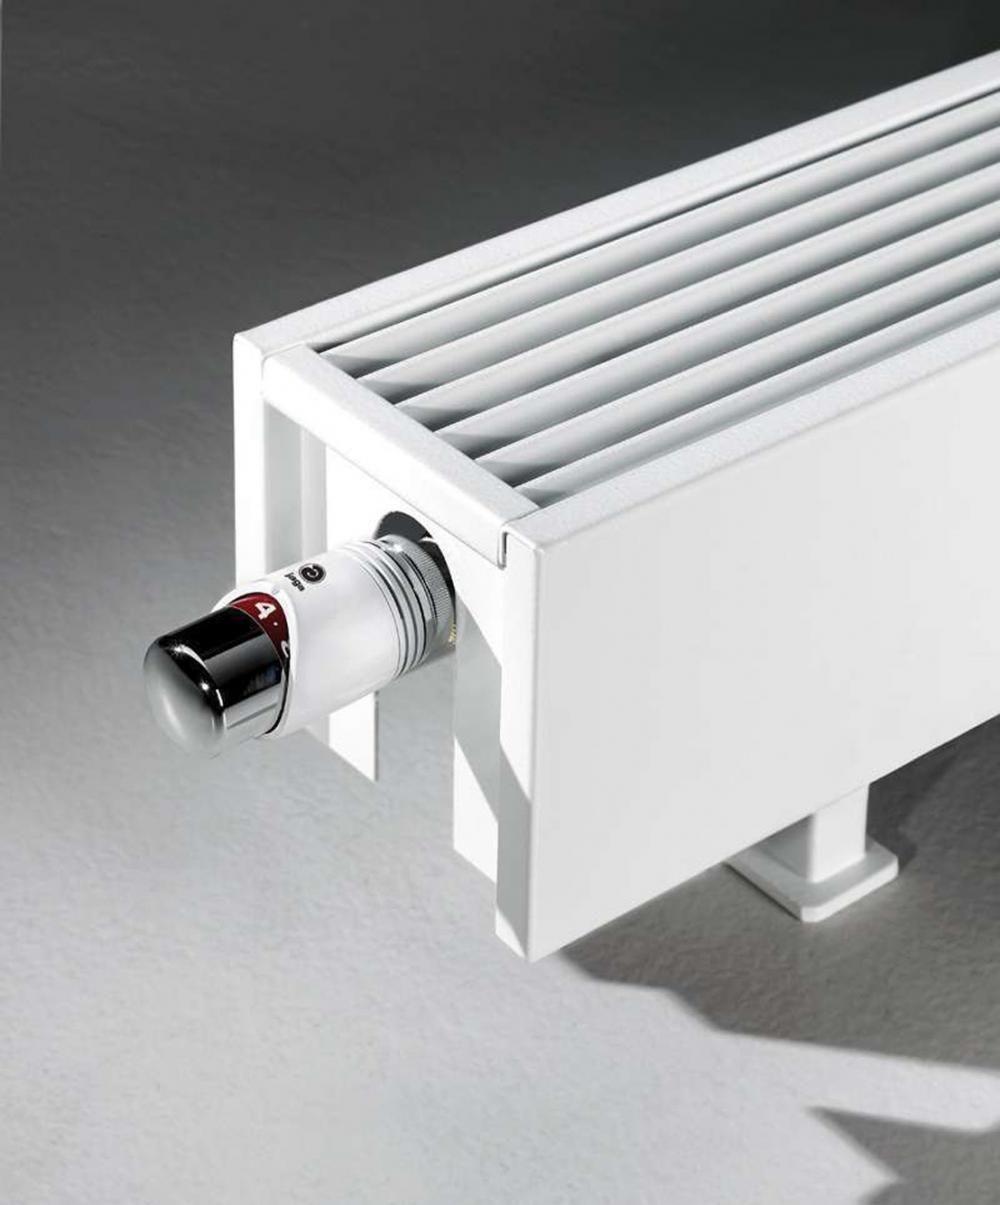 Calorifere Mini Freestanding 130x600x80 mm, 197 W